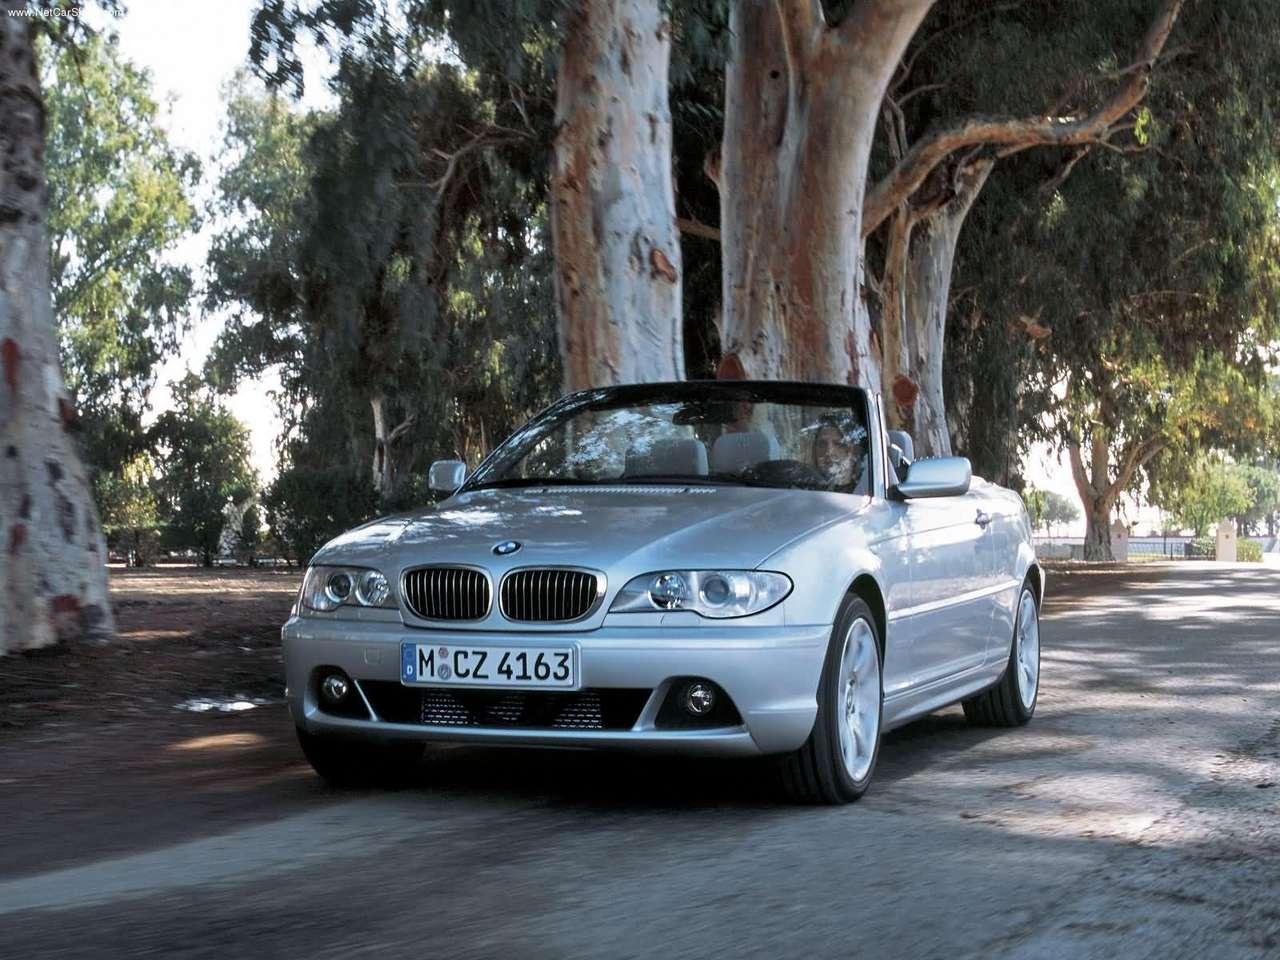 BMW - Auto twenty-first century: 2004 BMW 330Ci Convertible